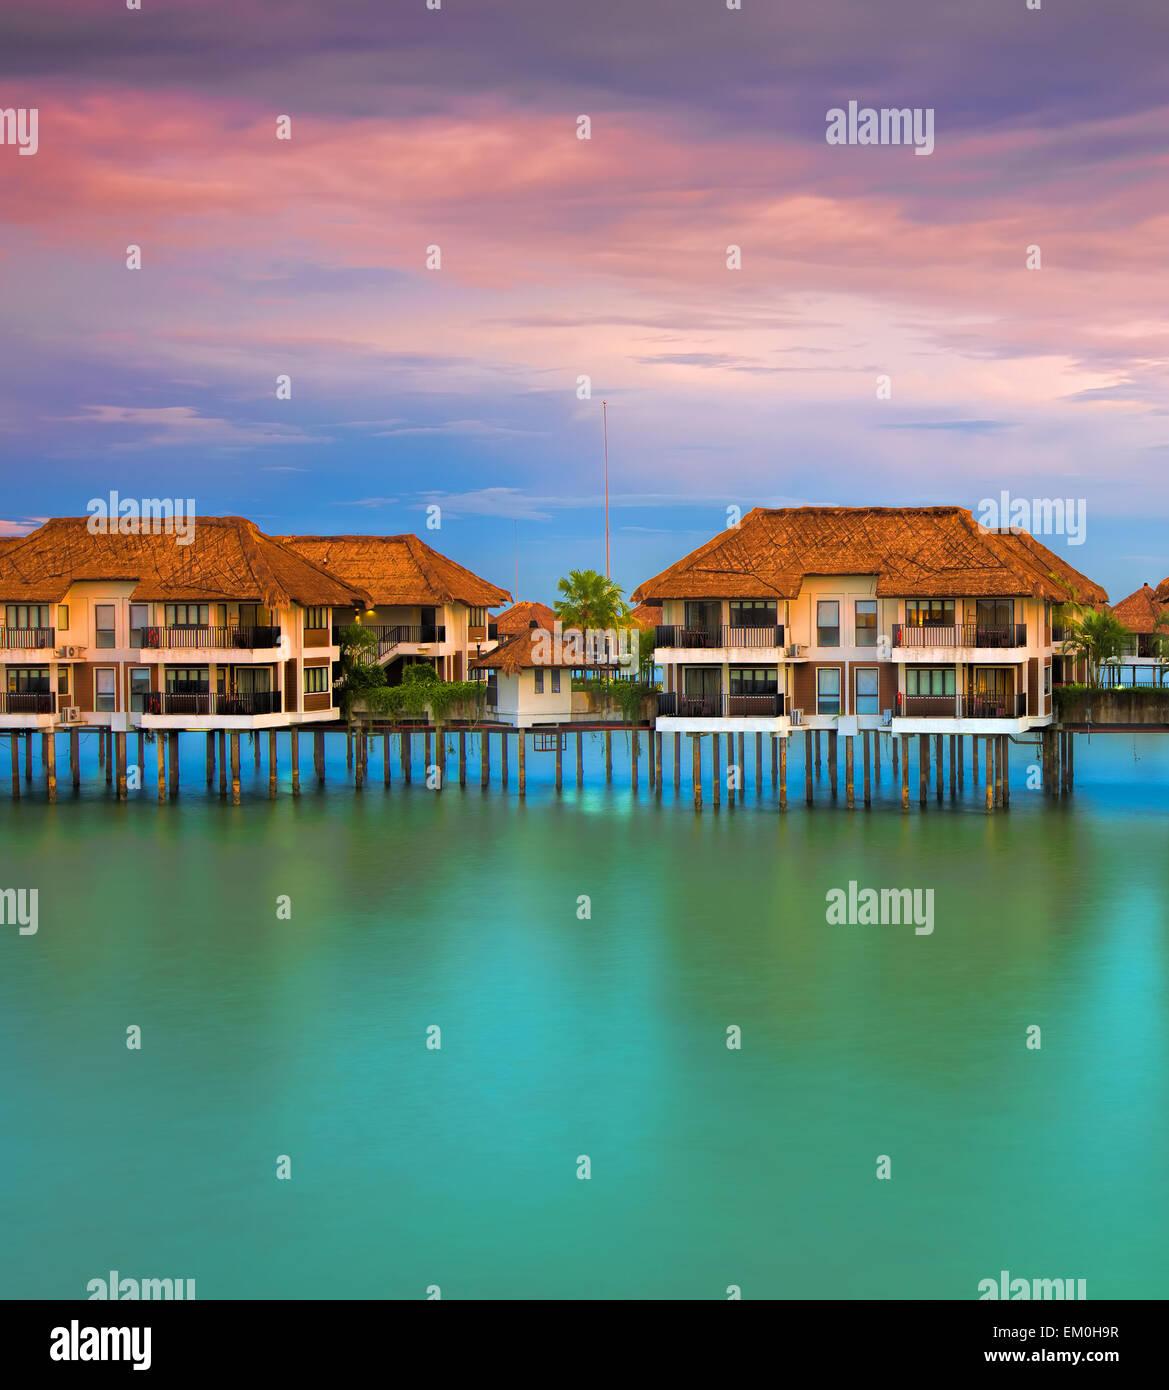 Water villas - Stock Image